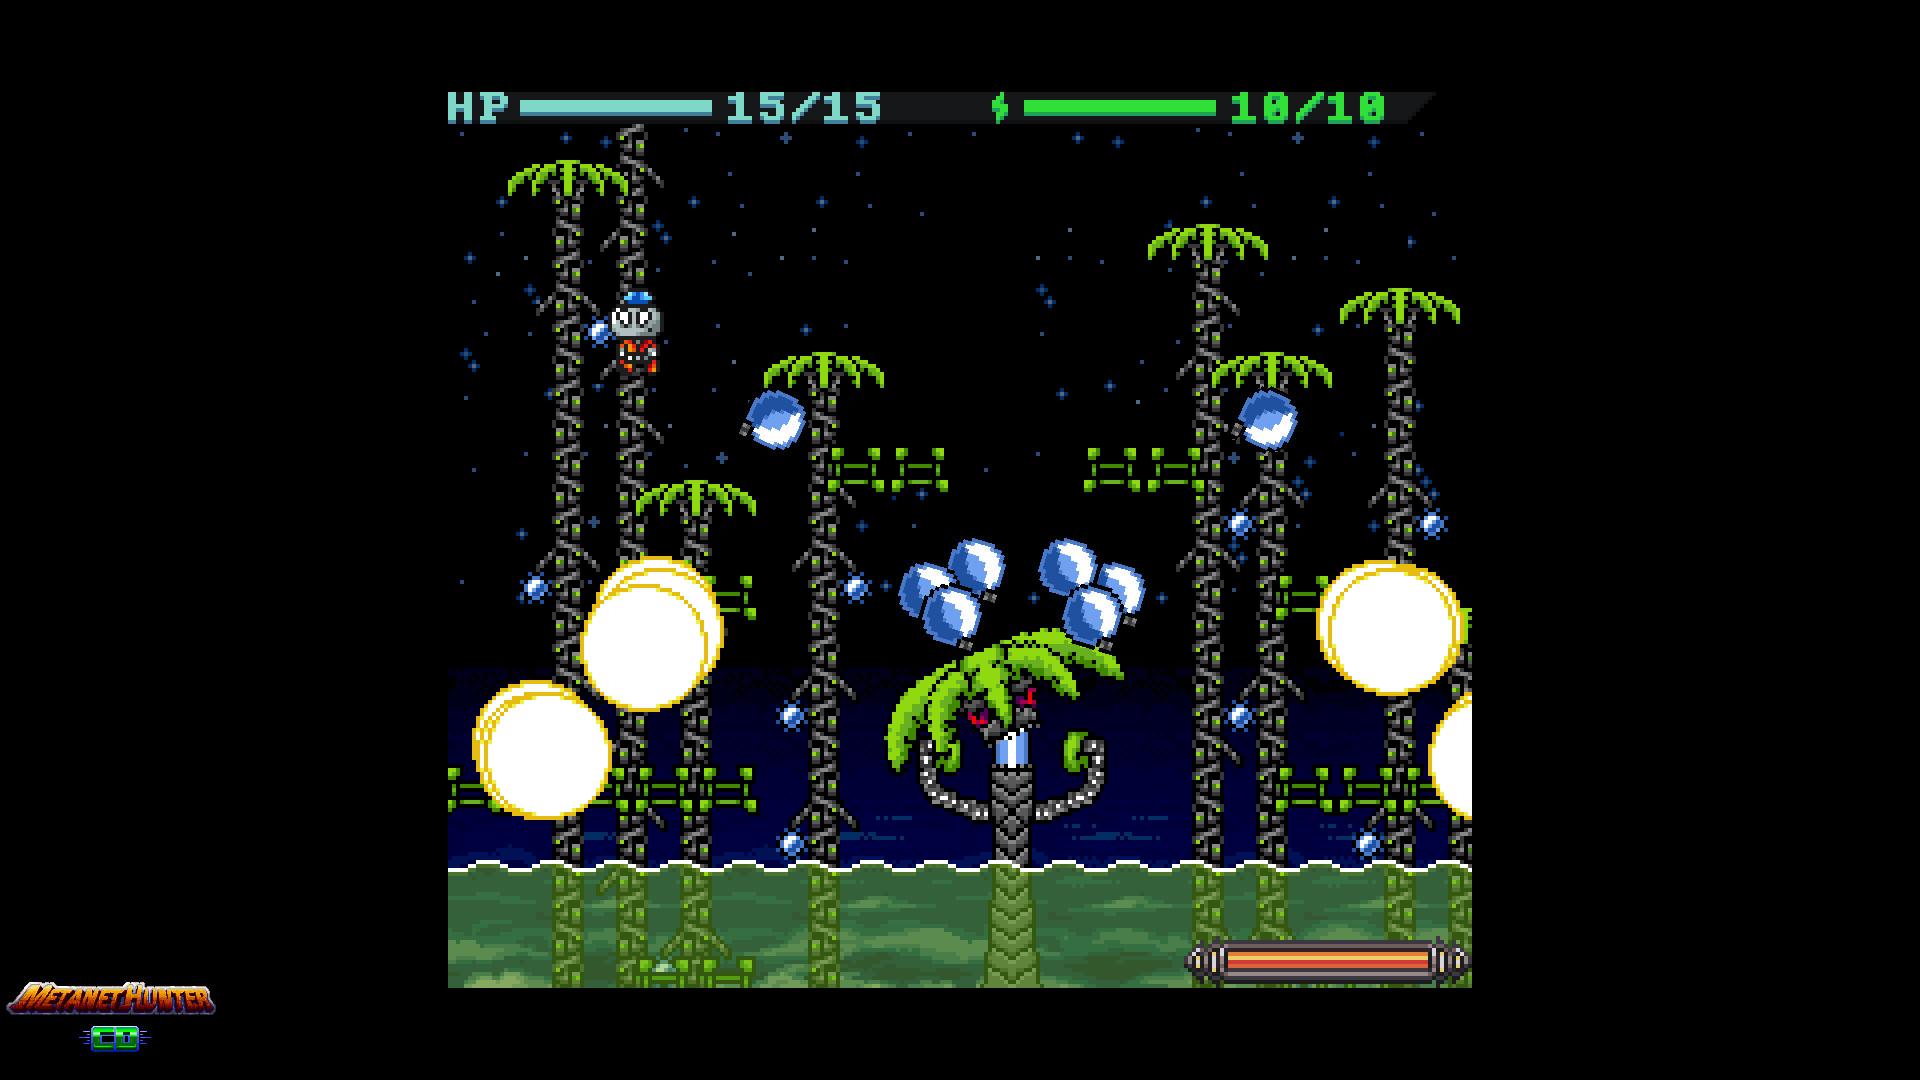 Metanet Hunter CD screenshot